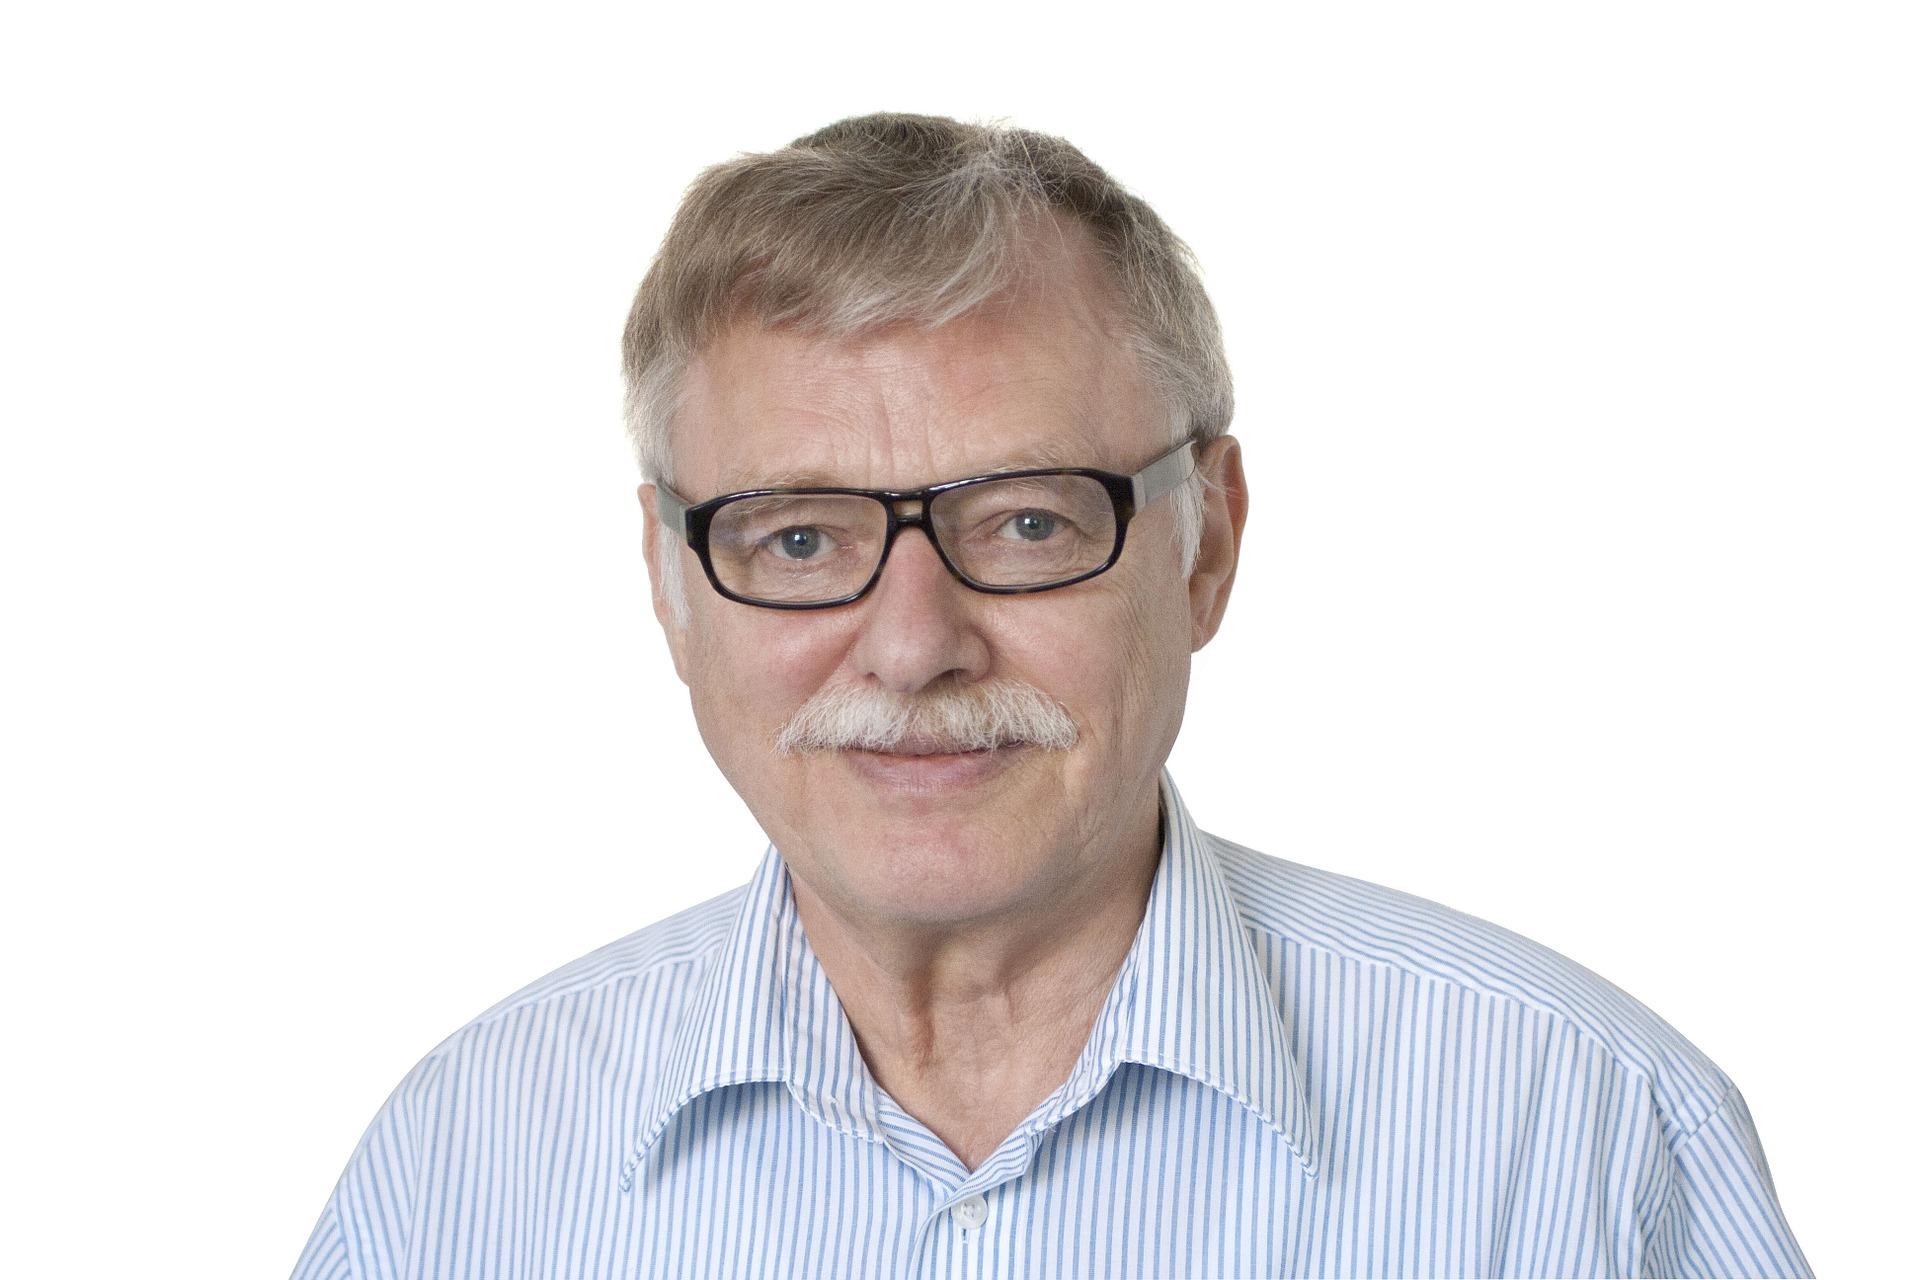 Профессор Иванов Александр